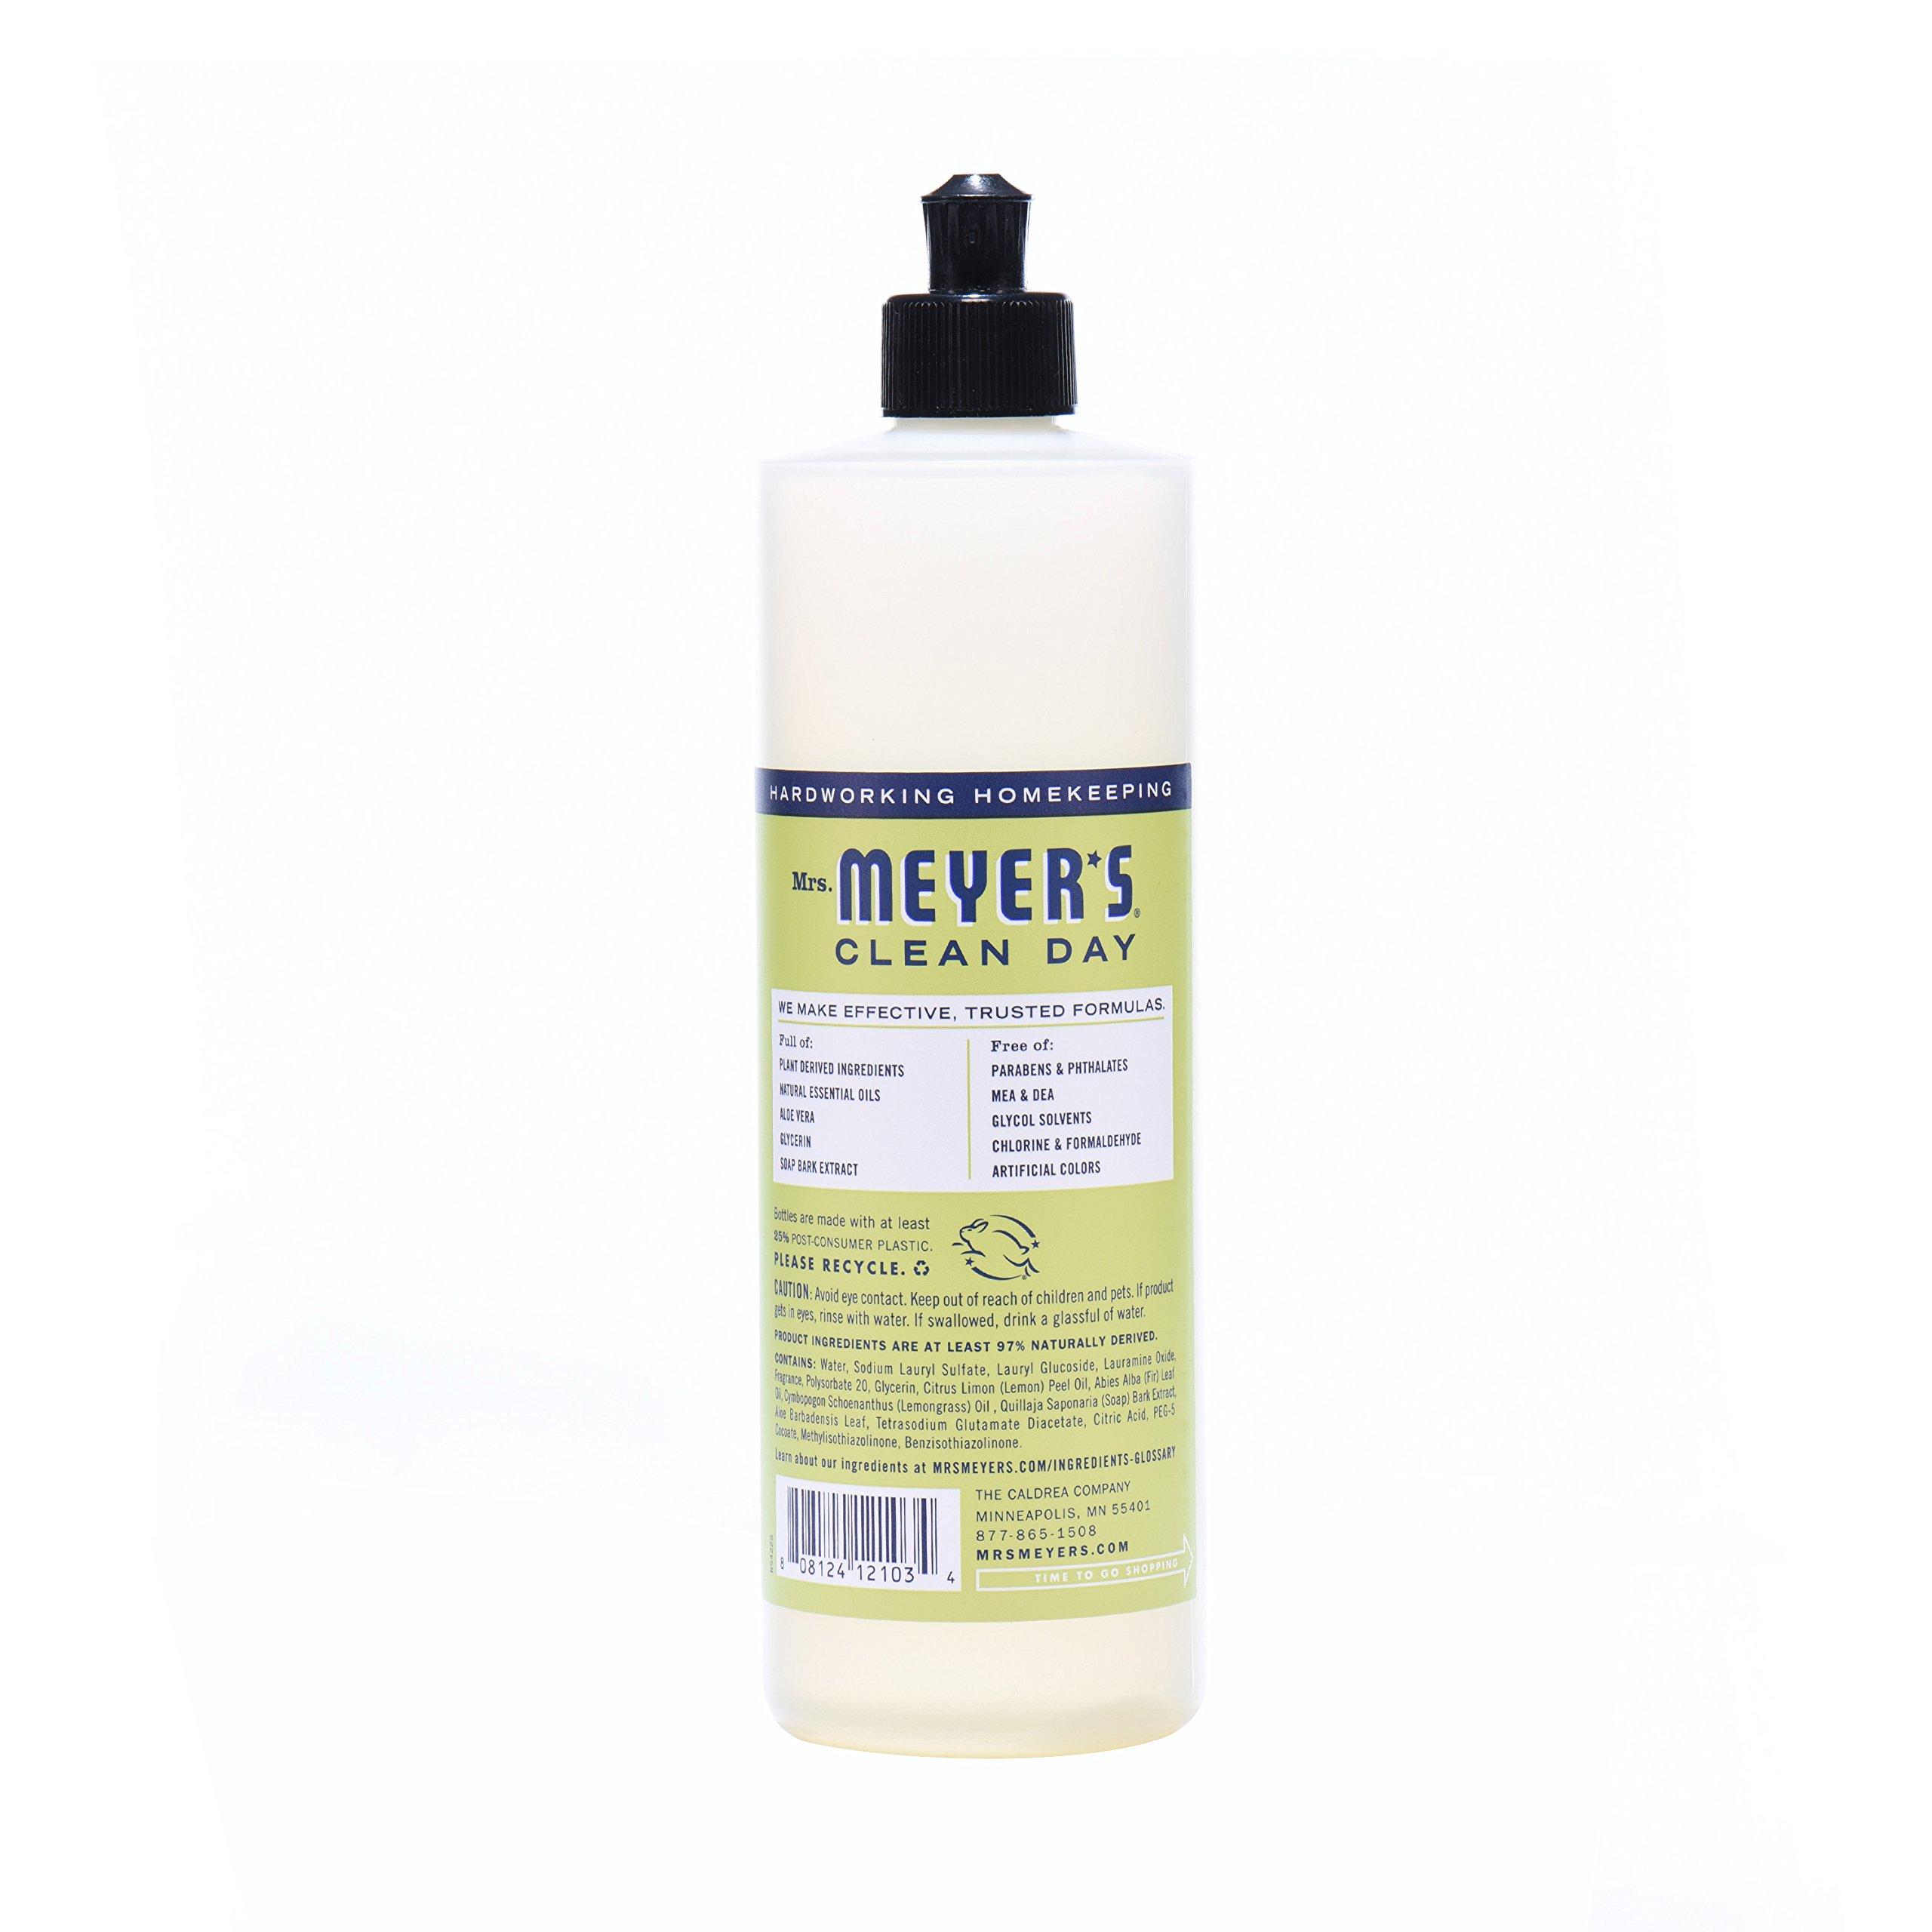 Mrs. Meyer's Clean Day Kitchen Basics Set, Lemon Verbena, 3 ct: Dish Soap (16 fl oz), Hand Soap (12.5 fl oz), Multi-Surface Everyday Cleaner (16 fl oz) by Mrs. Meyer's Clean Day (Image #5)